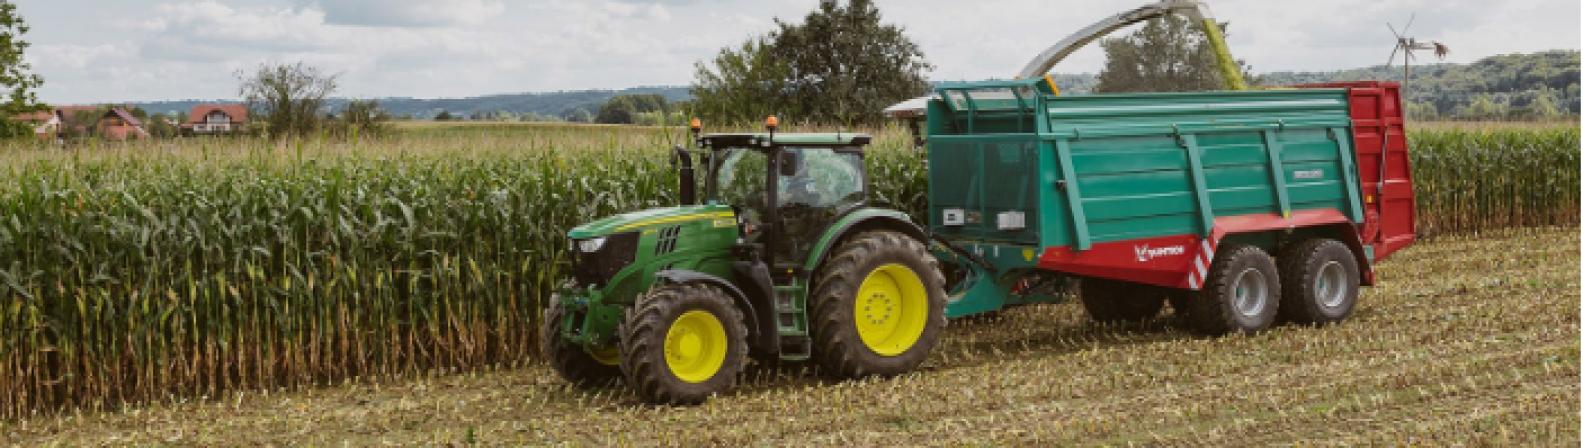 MK Landmaschinen Vertrieb Traktoren Feldarbeit